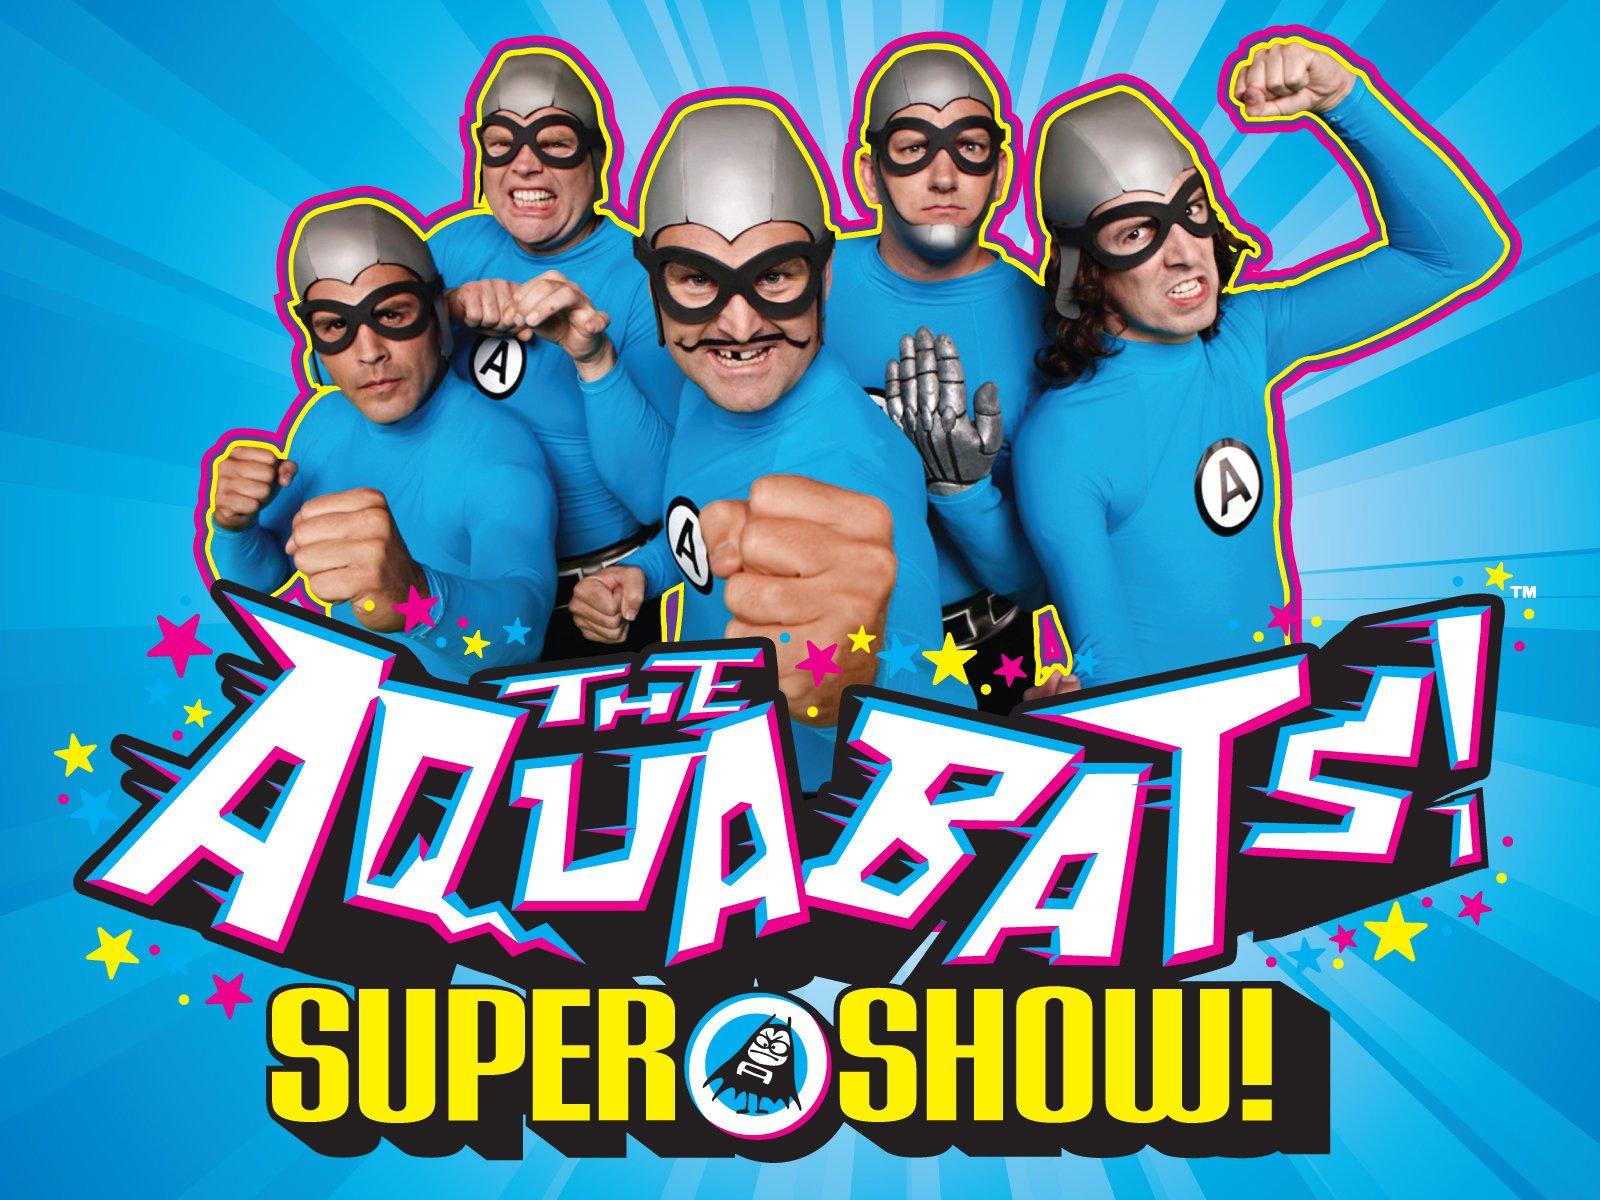 Activités très souterraines – The Aquabats